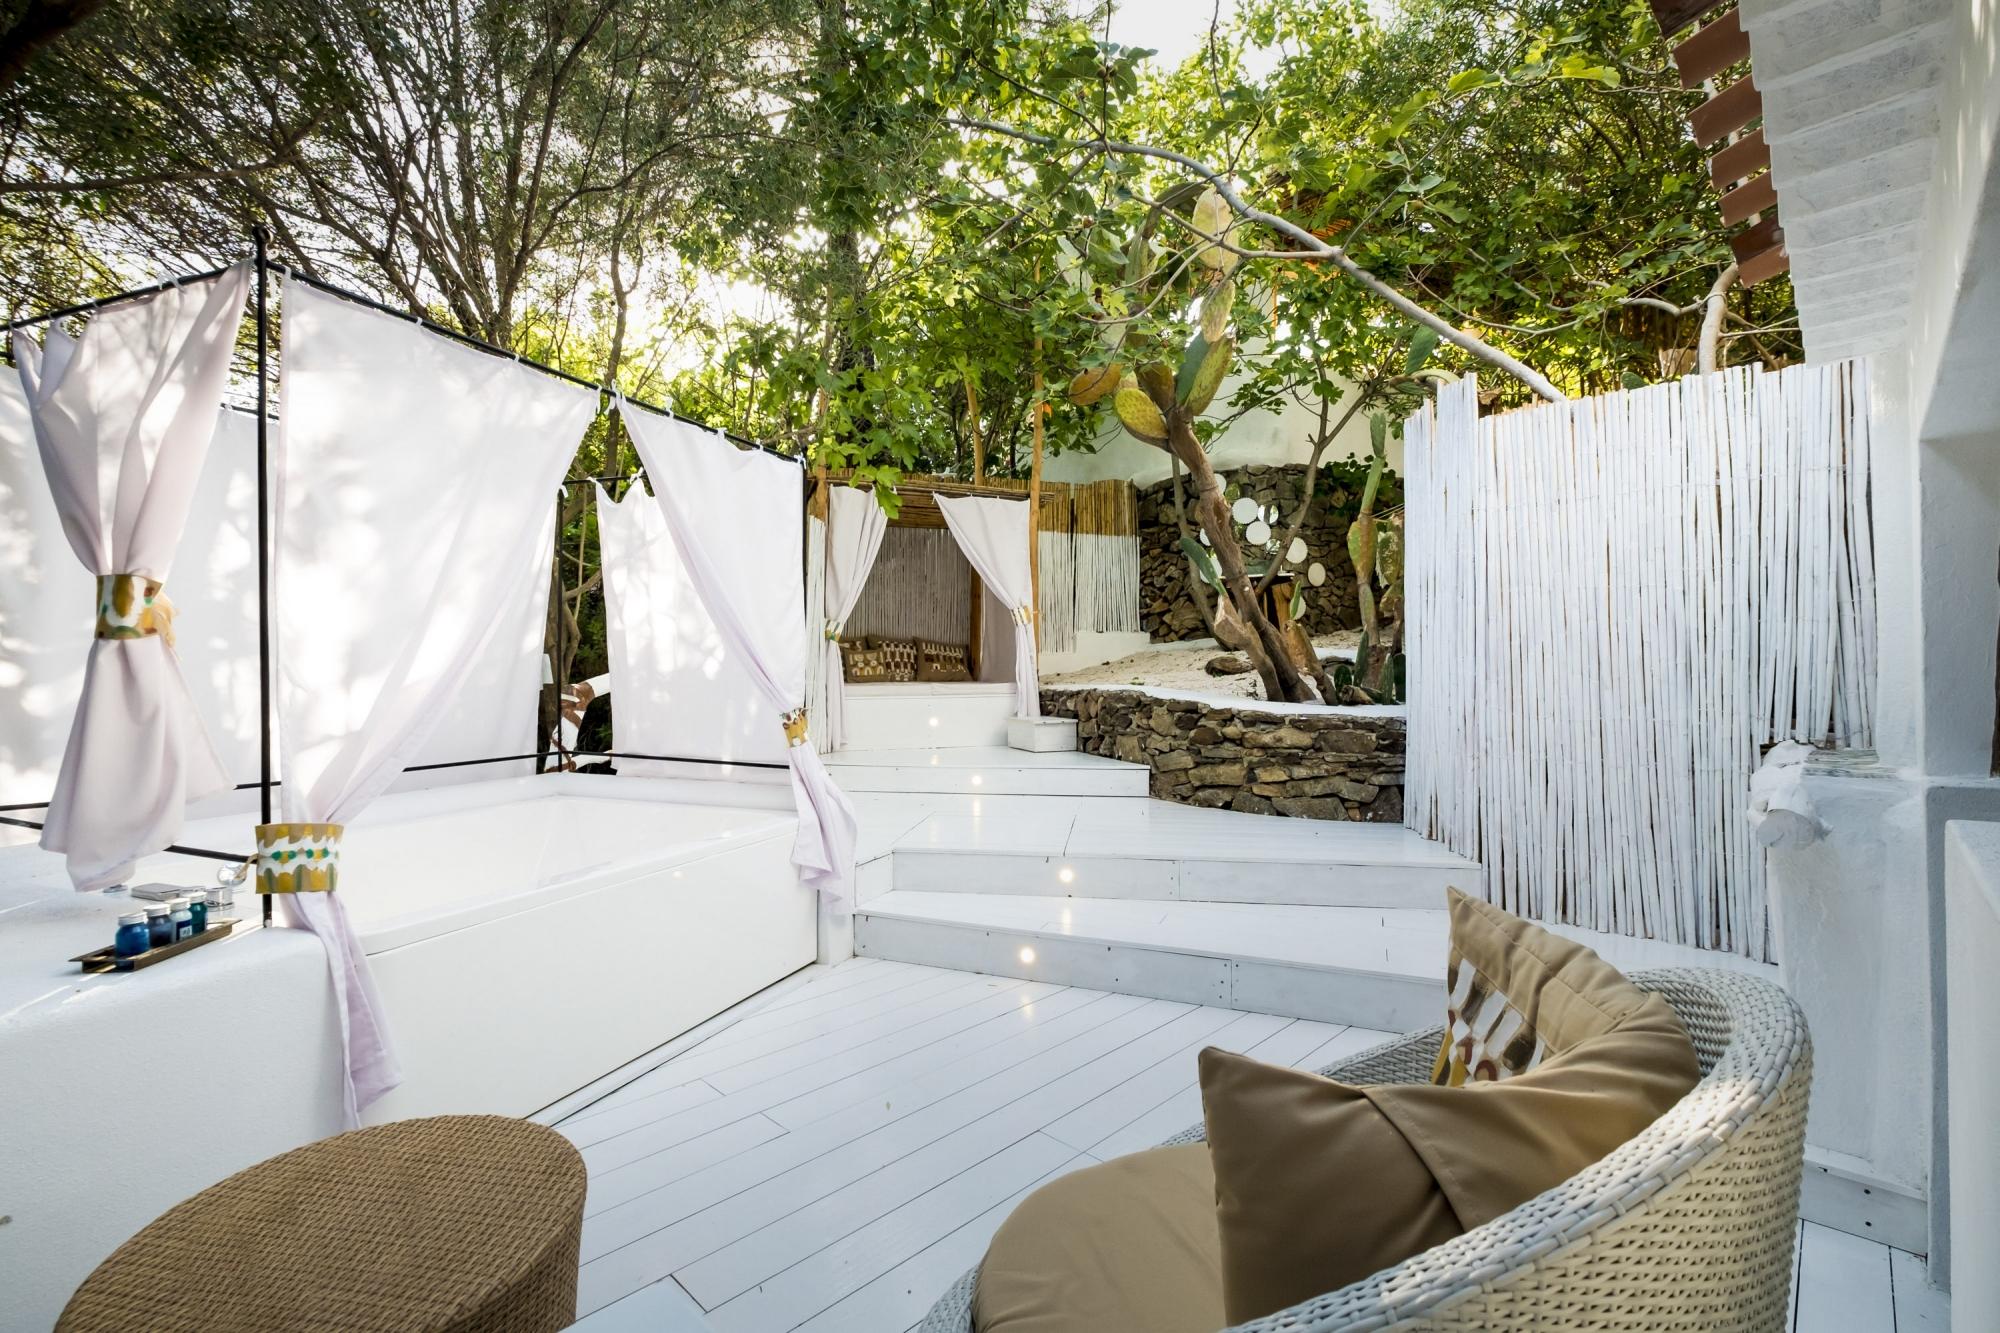 Wild Suite, Su Gologone, Sardegna, Treehouses